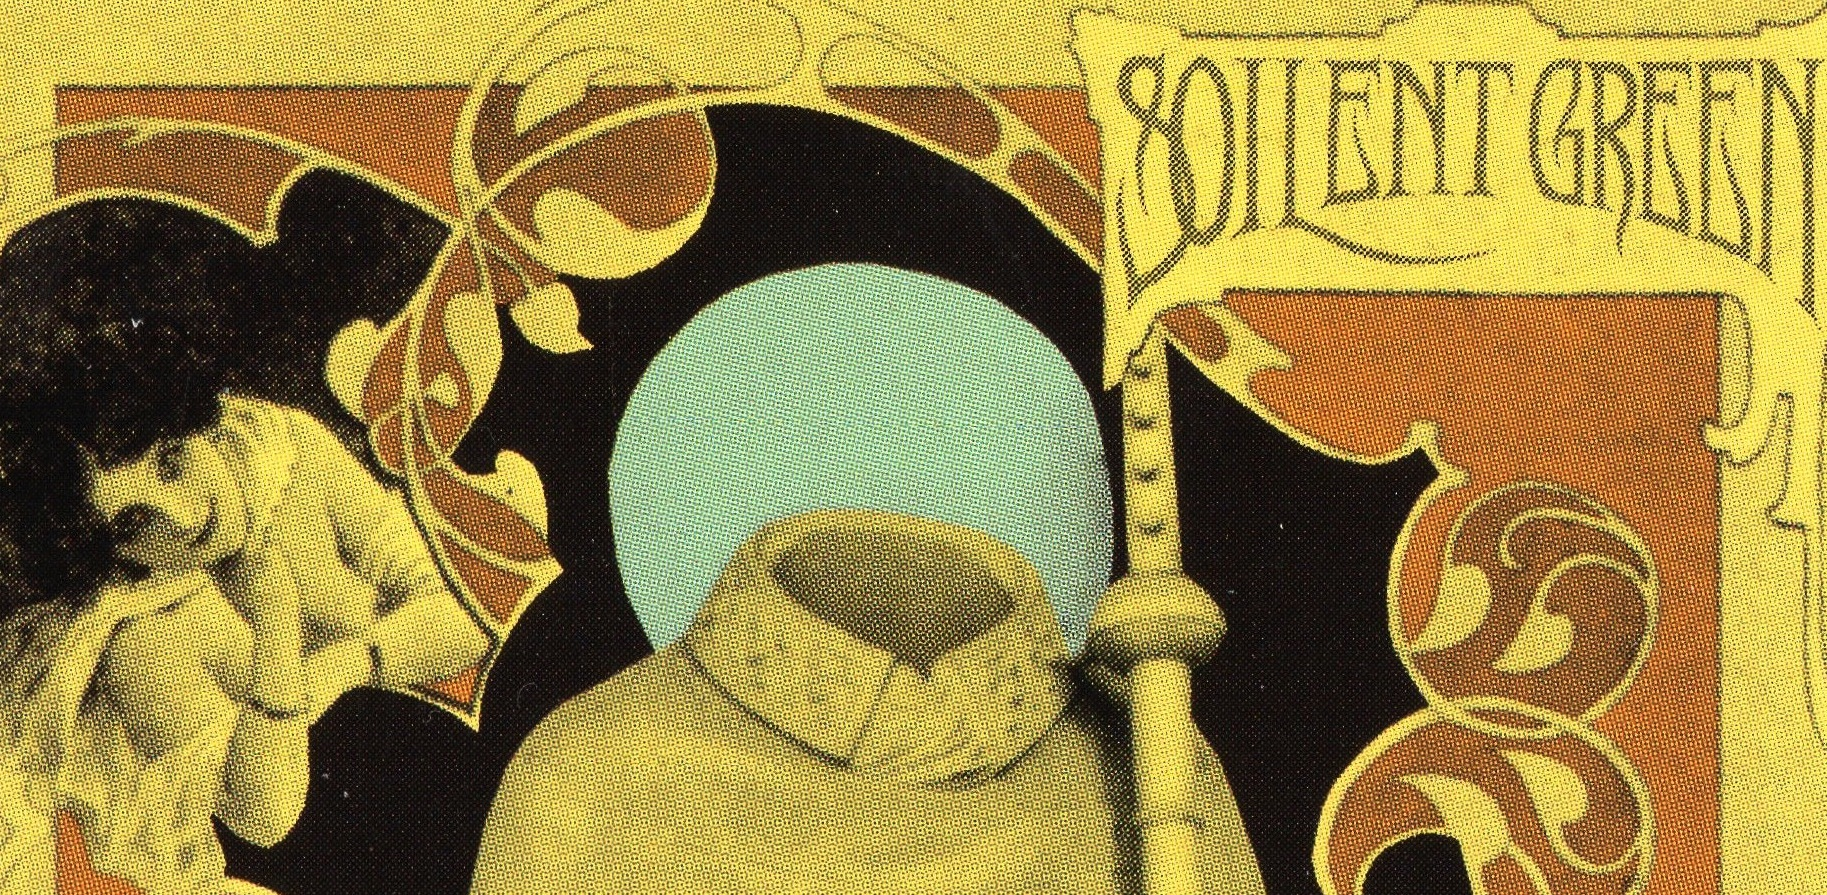 soilent_green_-_sewn_mouth_secrets_-_inside-1